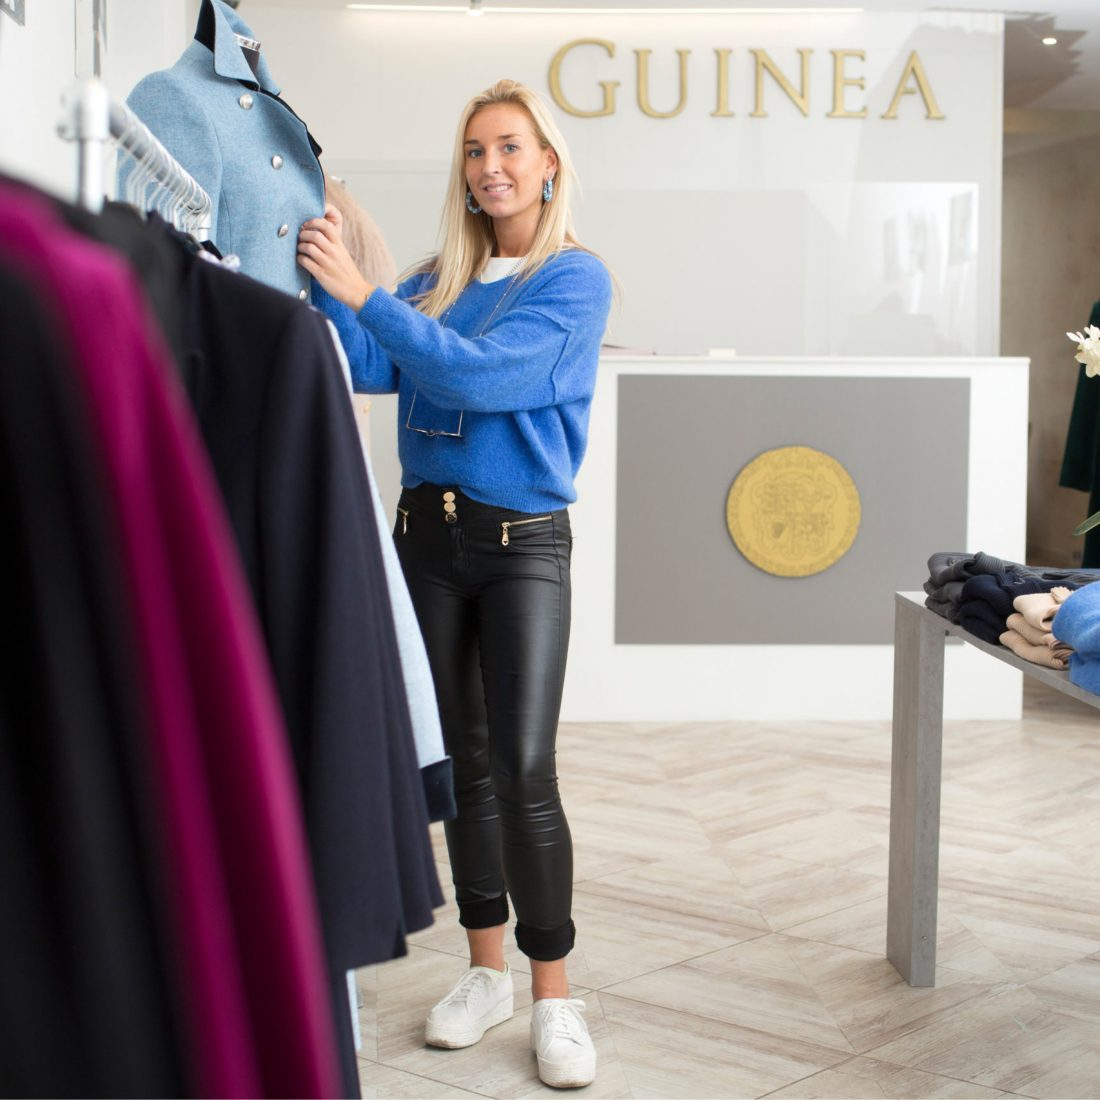 Guinea fashion store